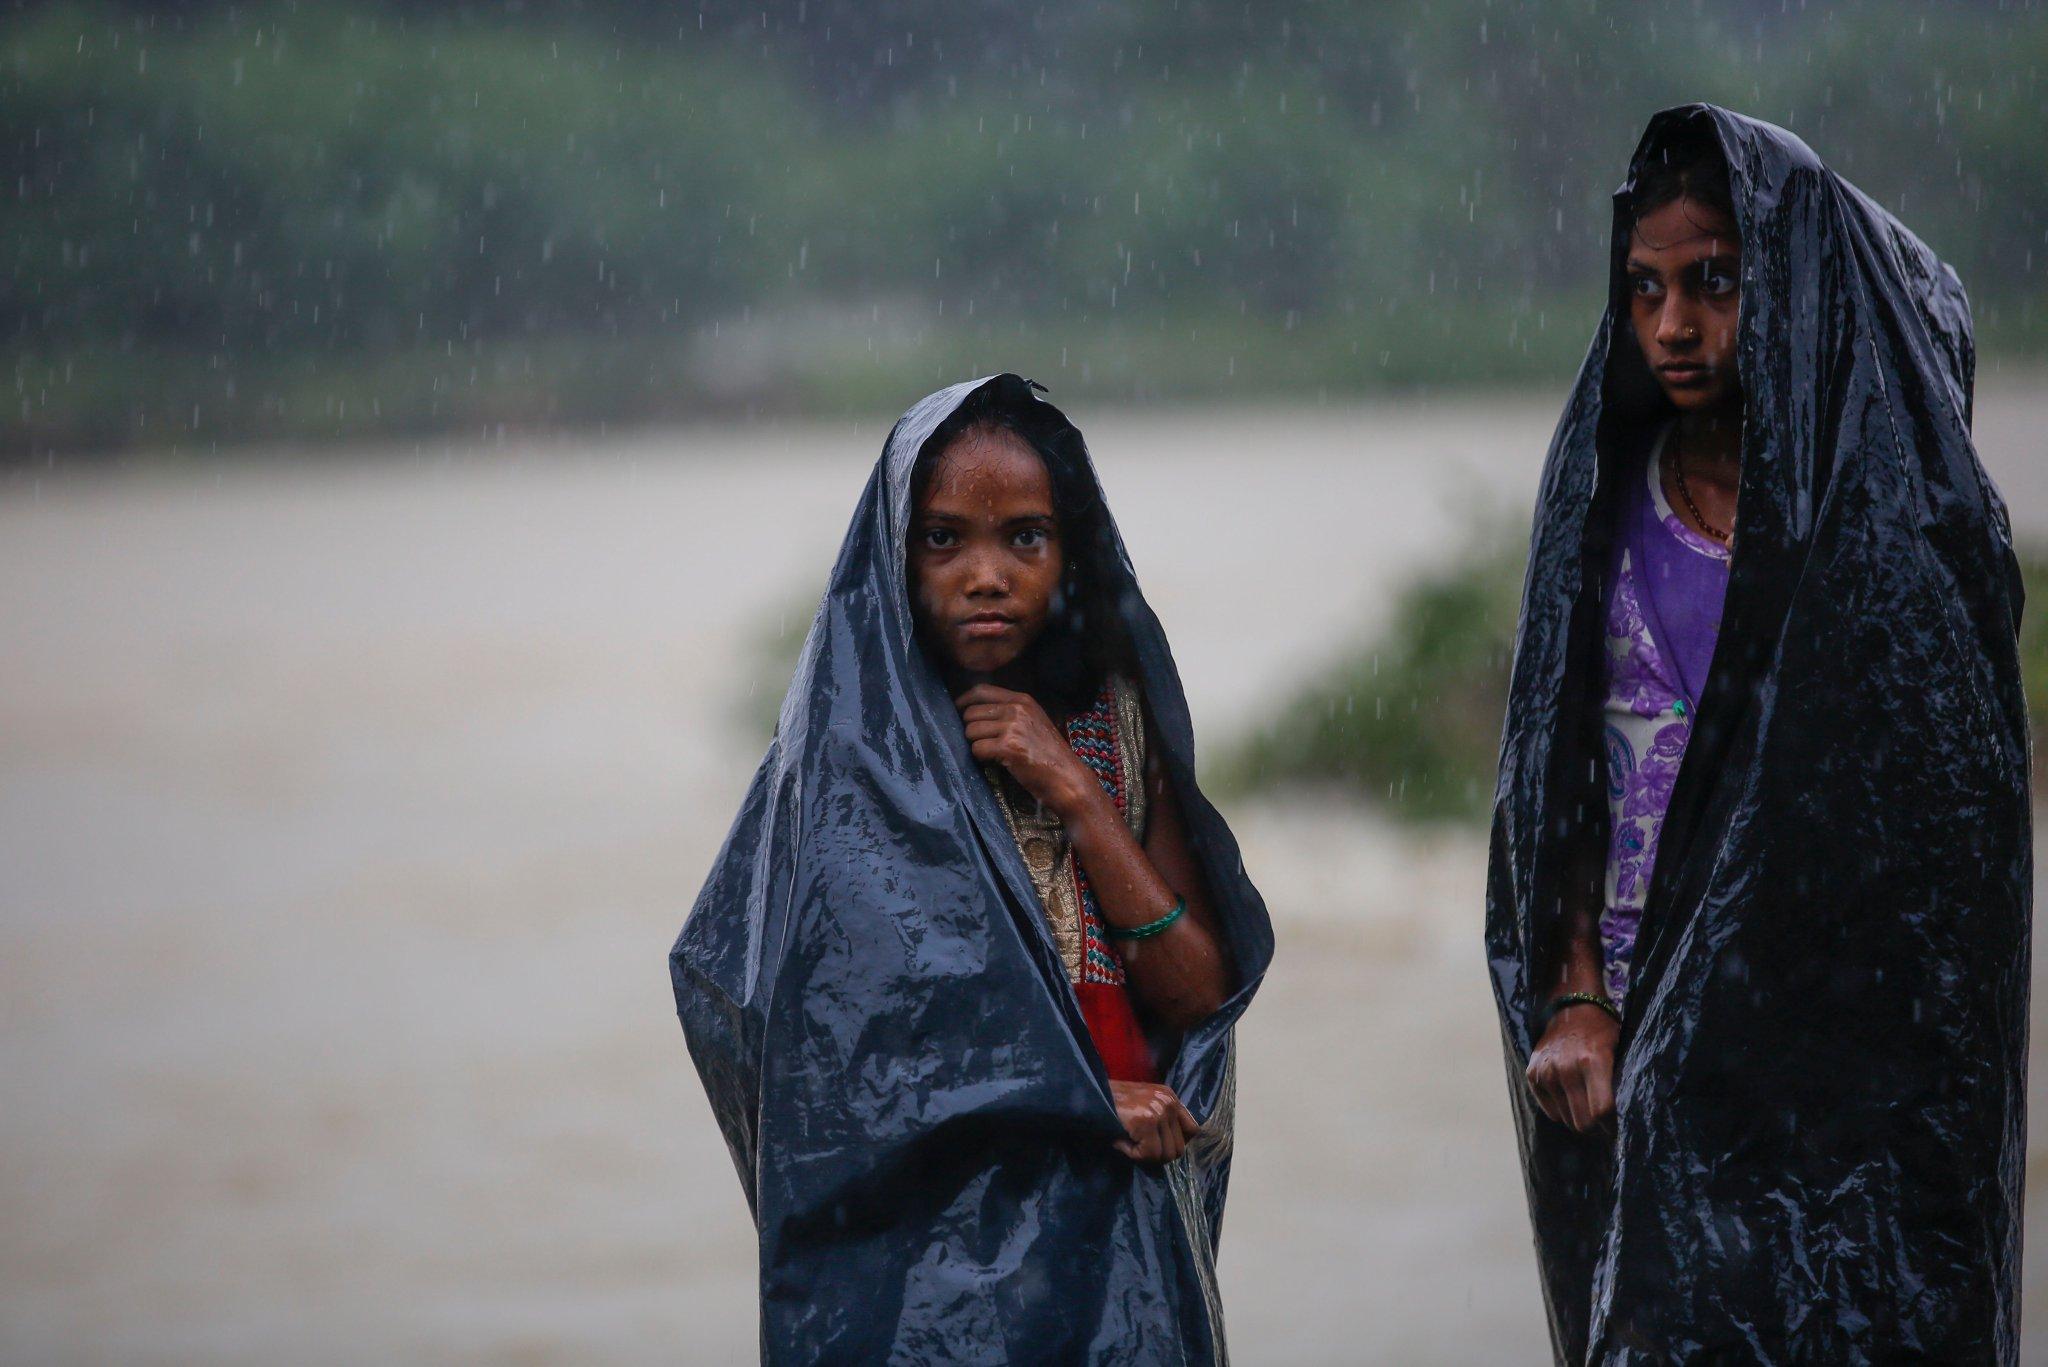 Nepal floods wash away hope, Asian Access responds